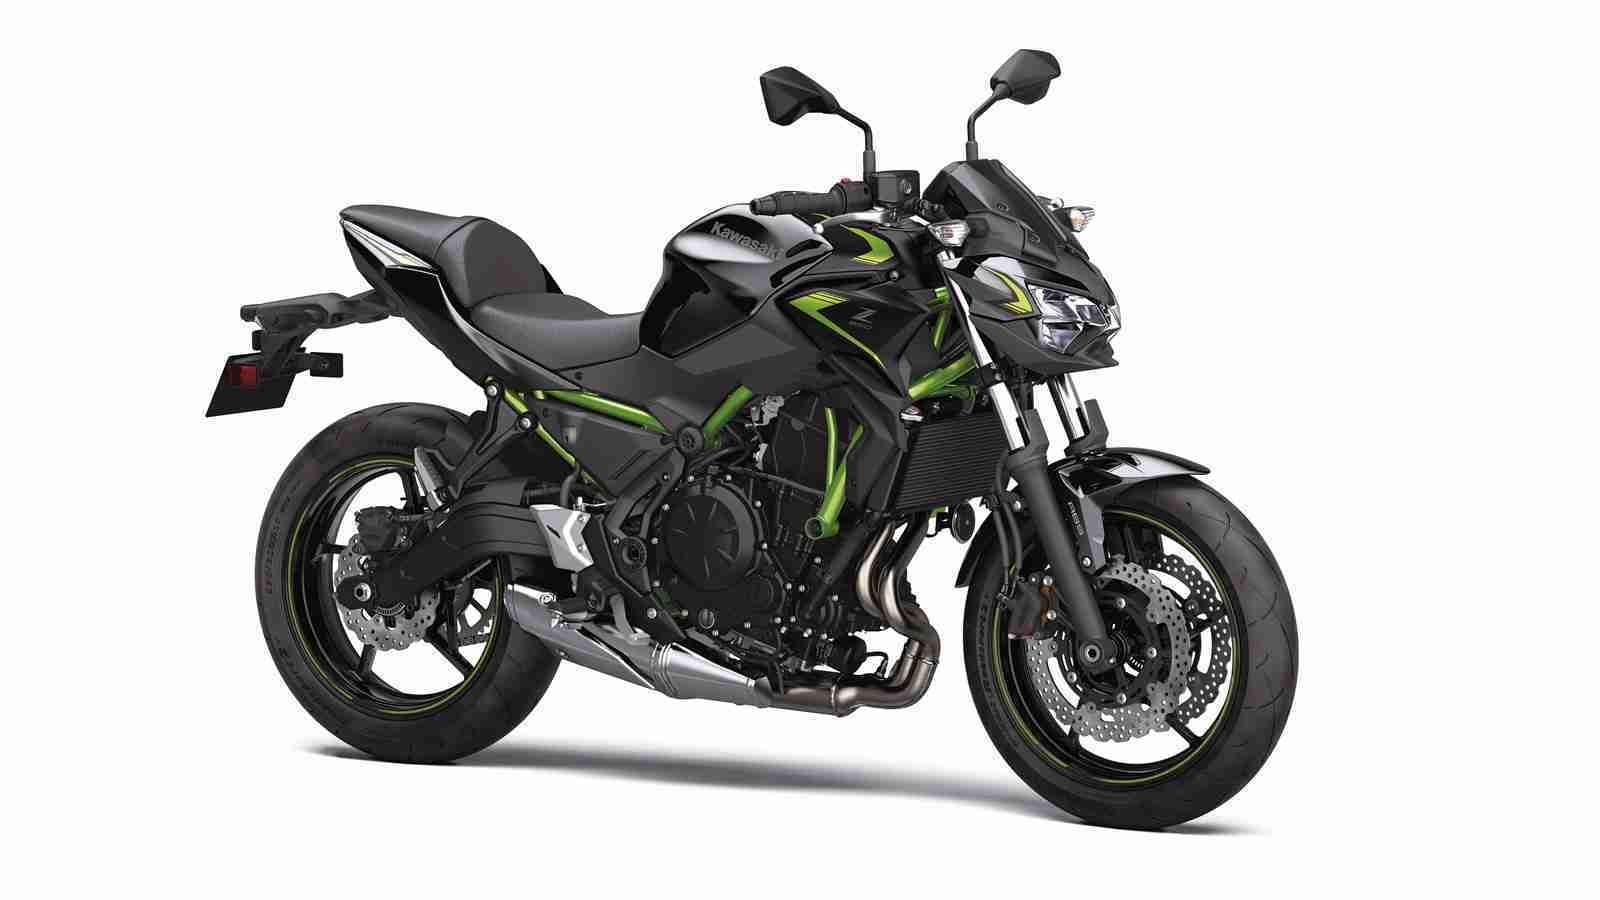 BS6 2022 Kawasaki Z650 CANDY LIME GREEN TYPE 3 colour option